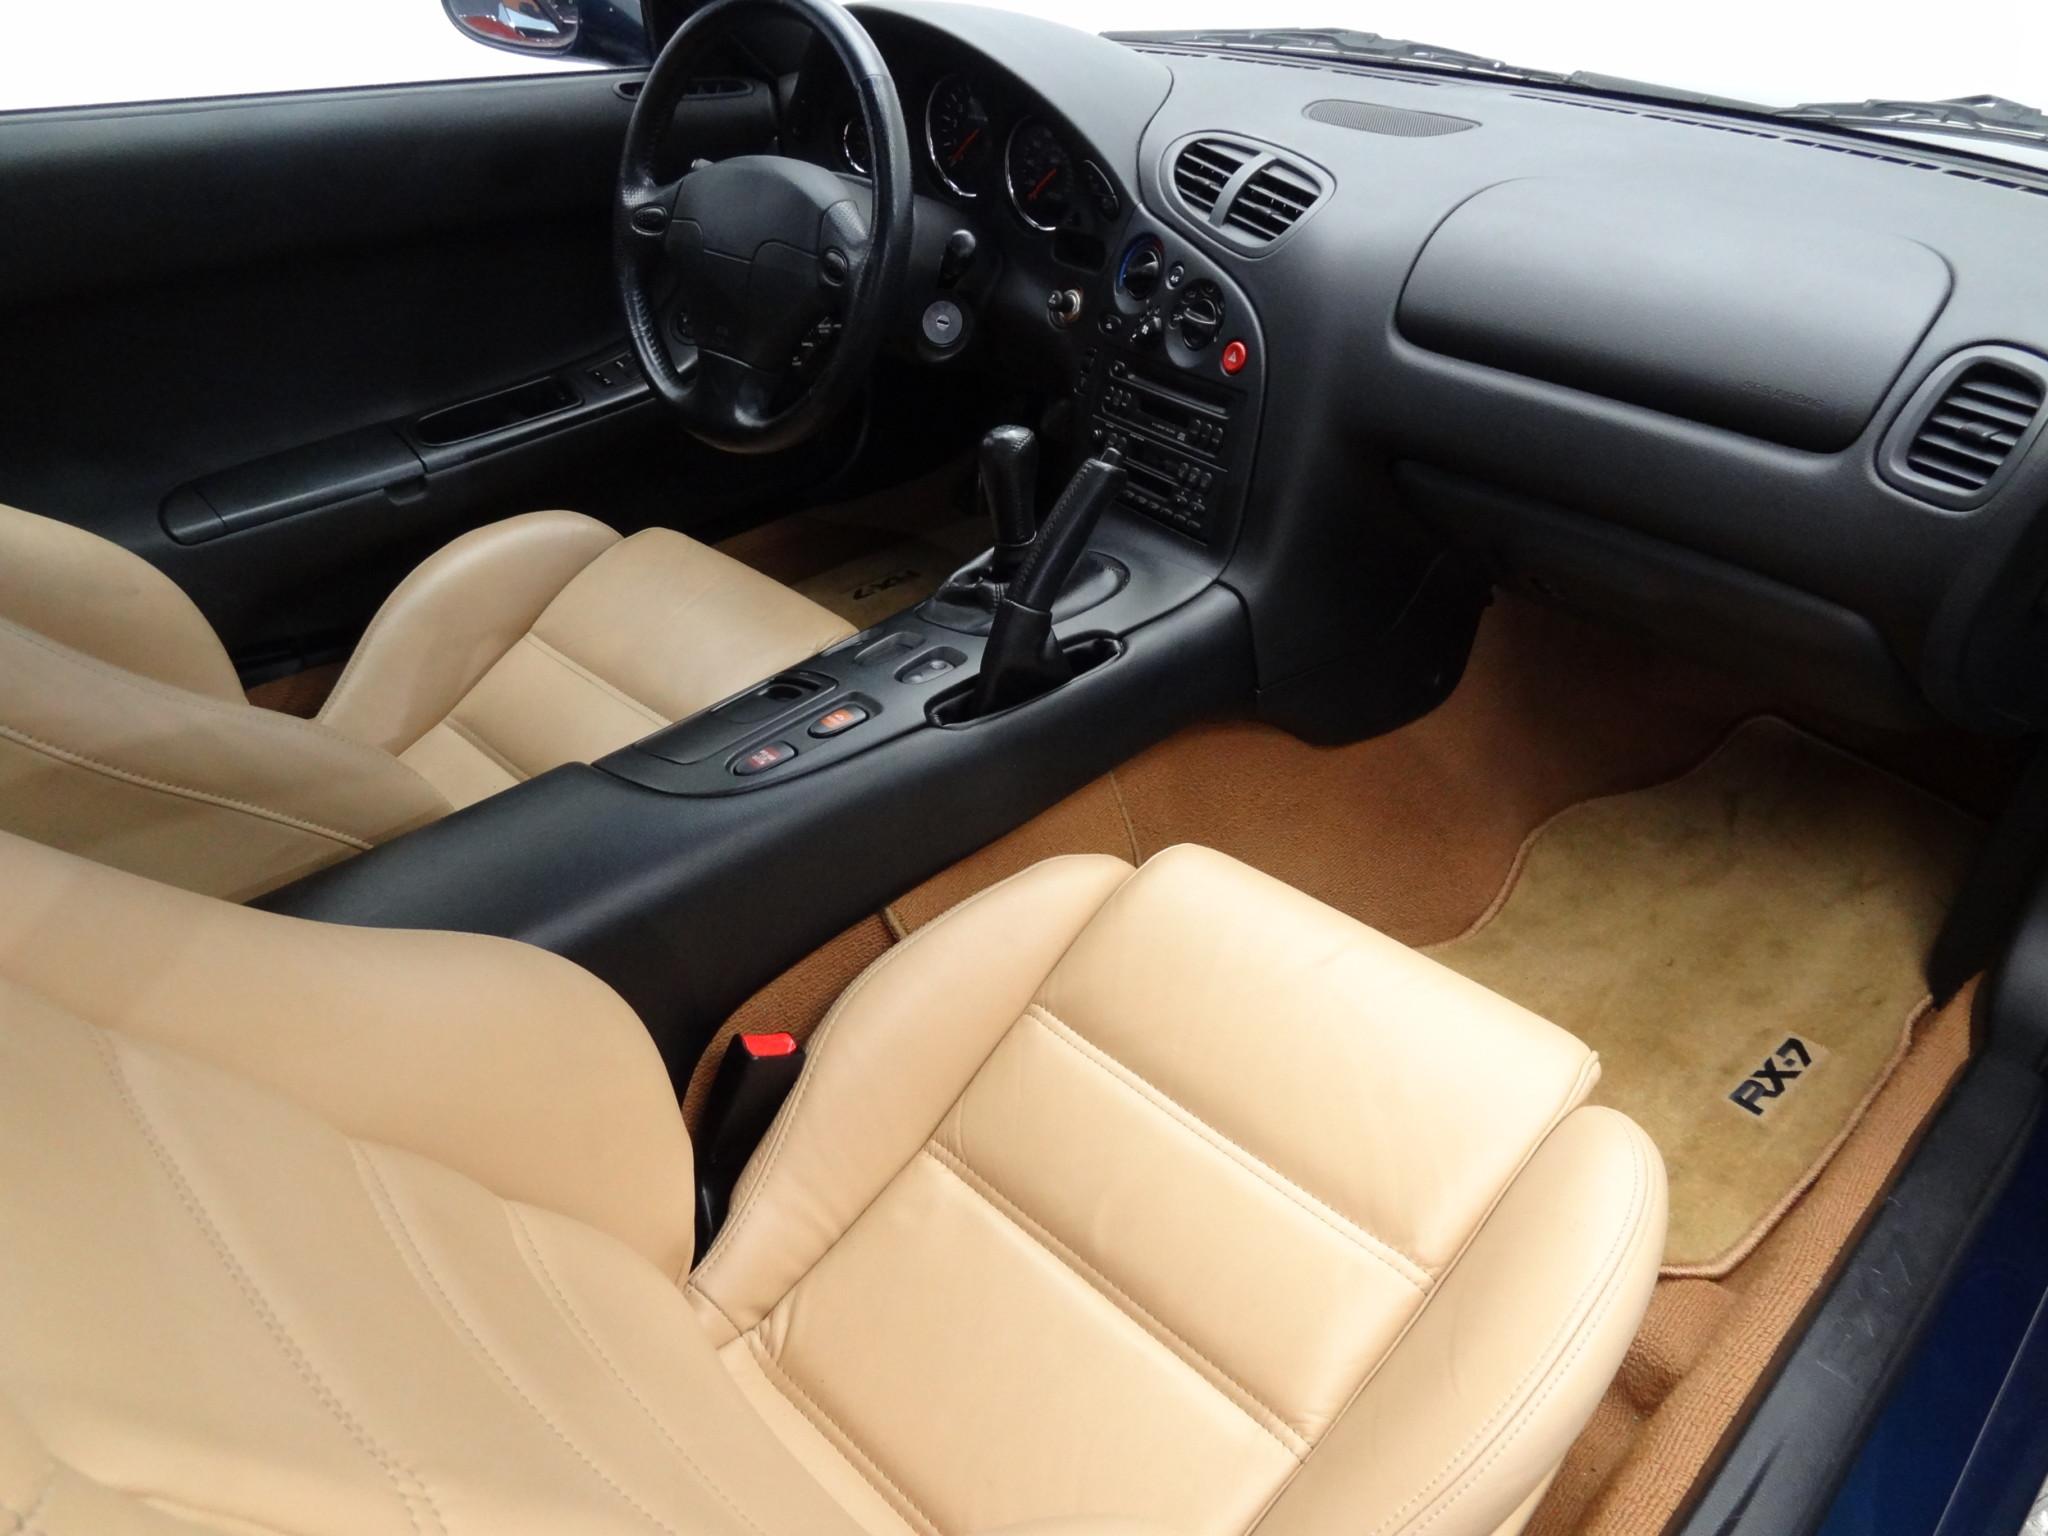 1994 Mazda RX-7 interior passenger